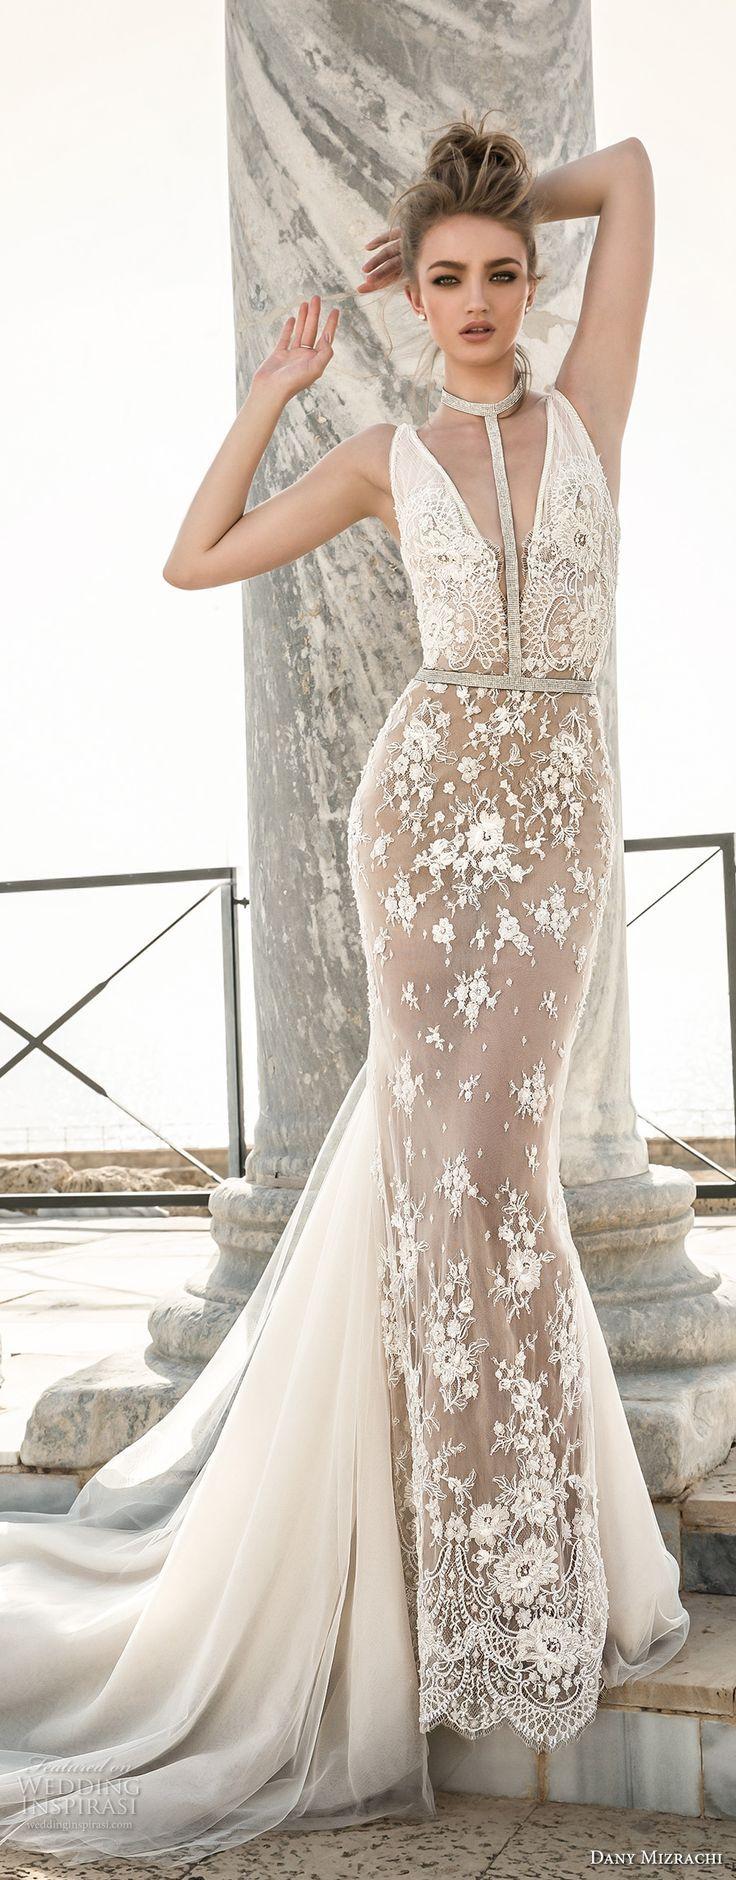 Dany mizrachi bridal sleeveless deep v neckline full